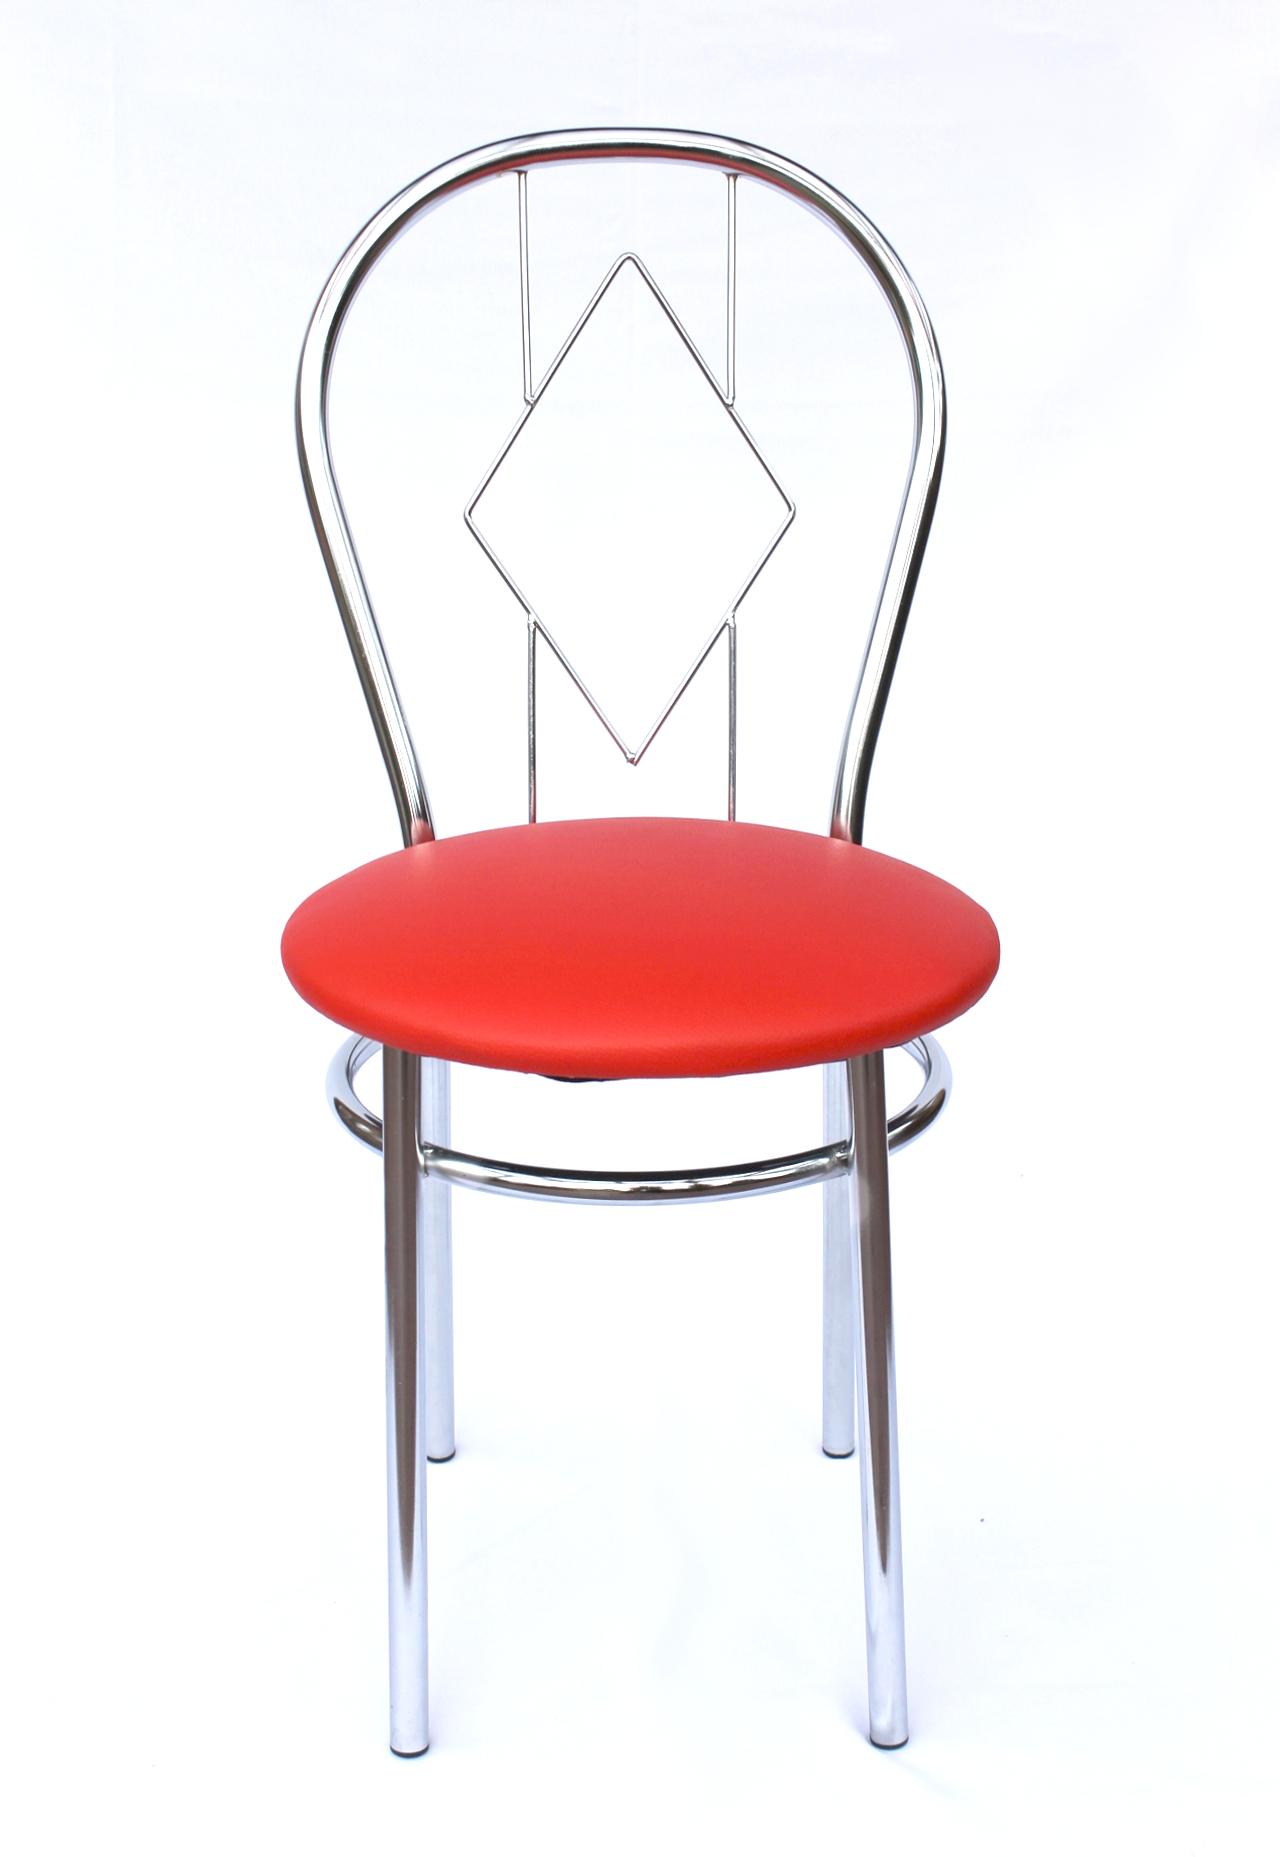 stuhl aus metall bistrostuhl karo 88cm verchromt st hle dandibo. Black Bedroom Furniture Sets. Home Design Ideas